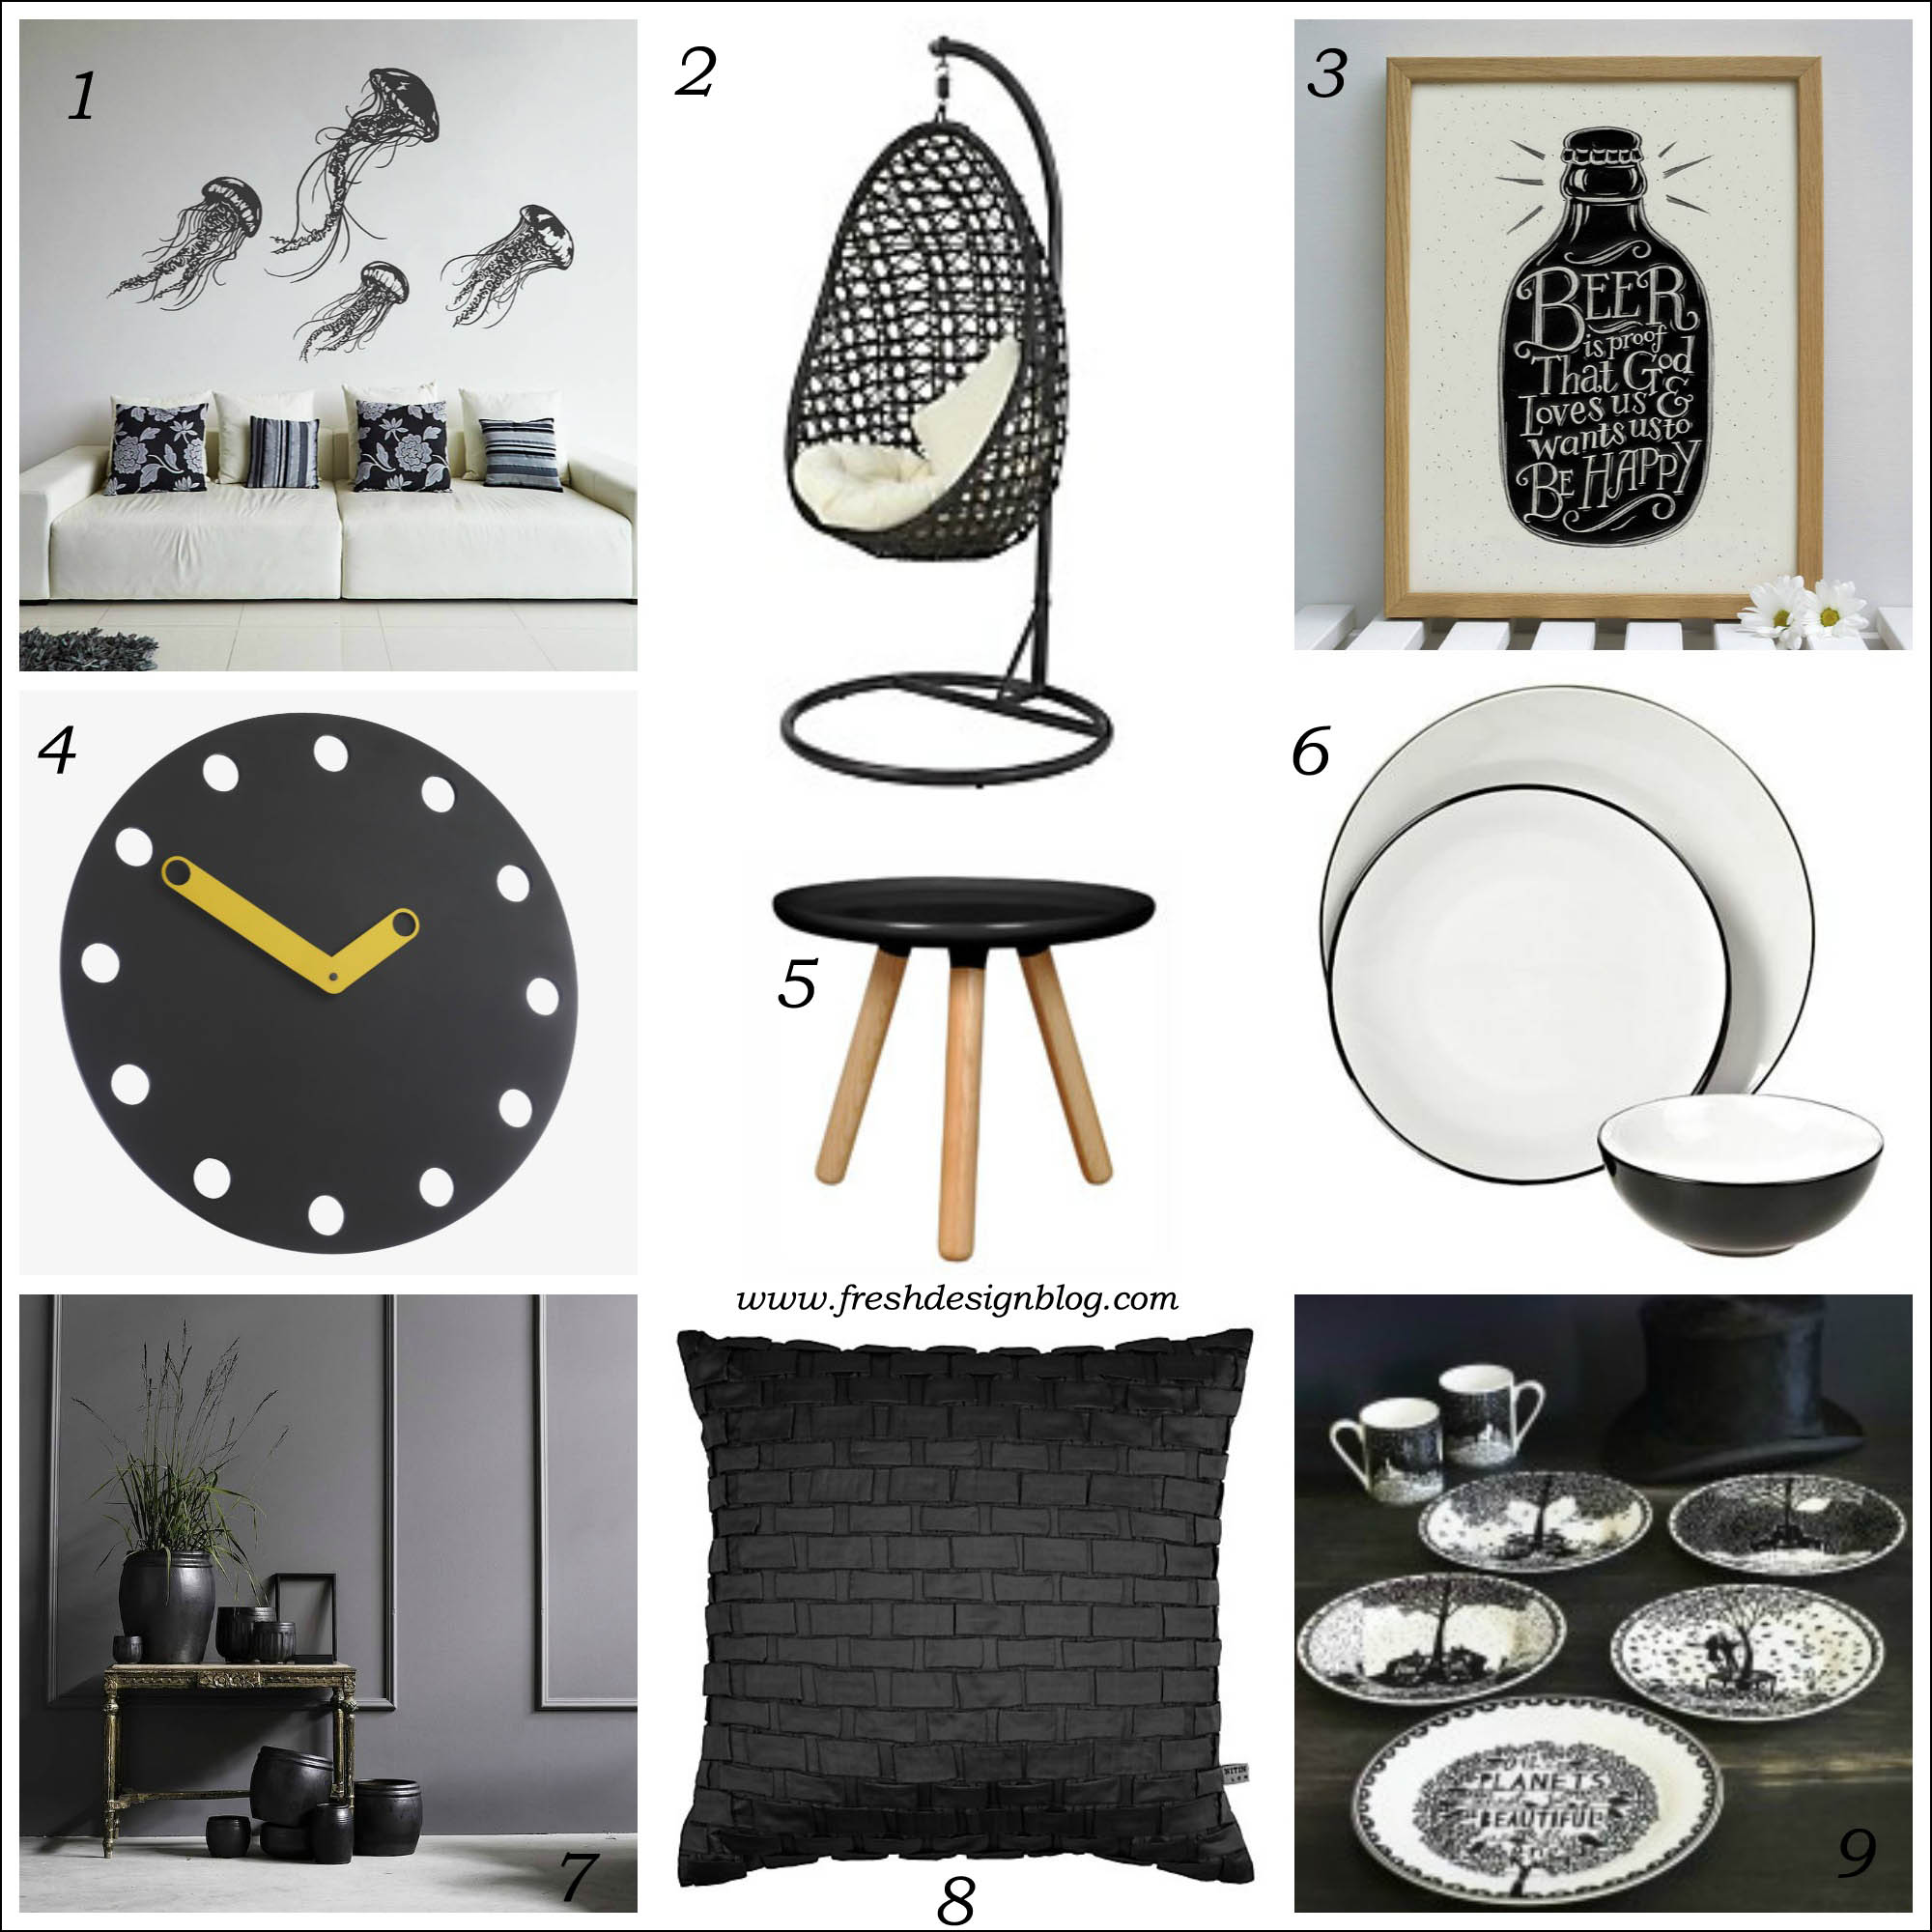 Black and white delight monochrome home accessories for Fresh design blog